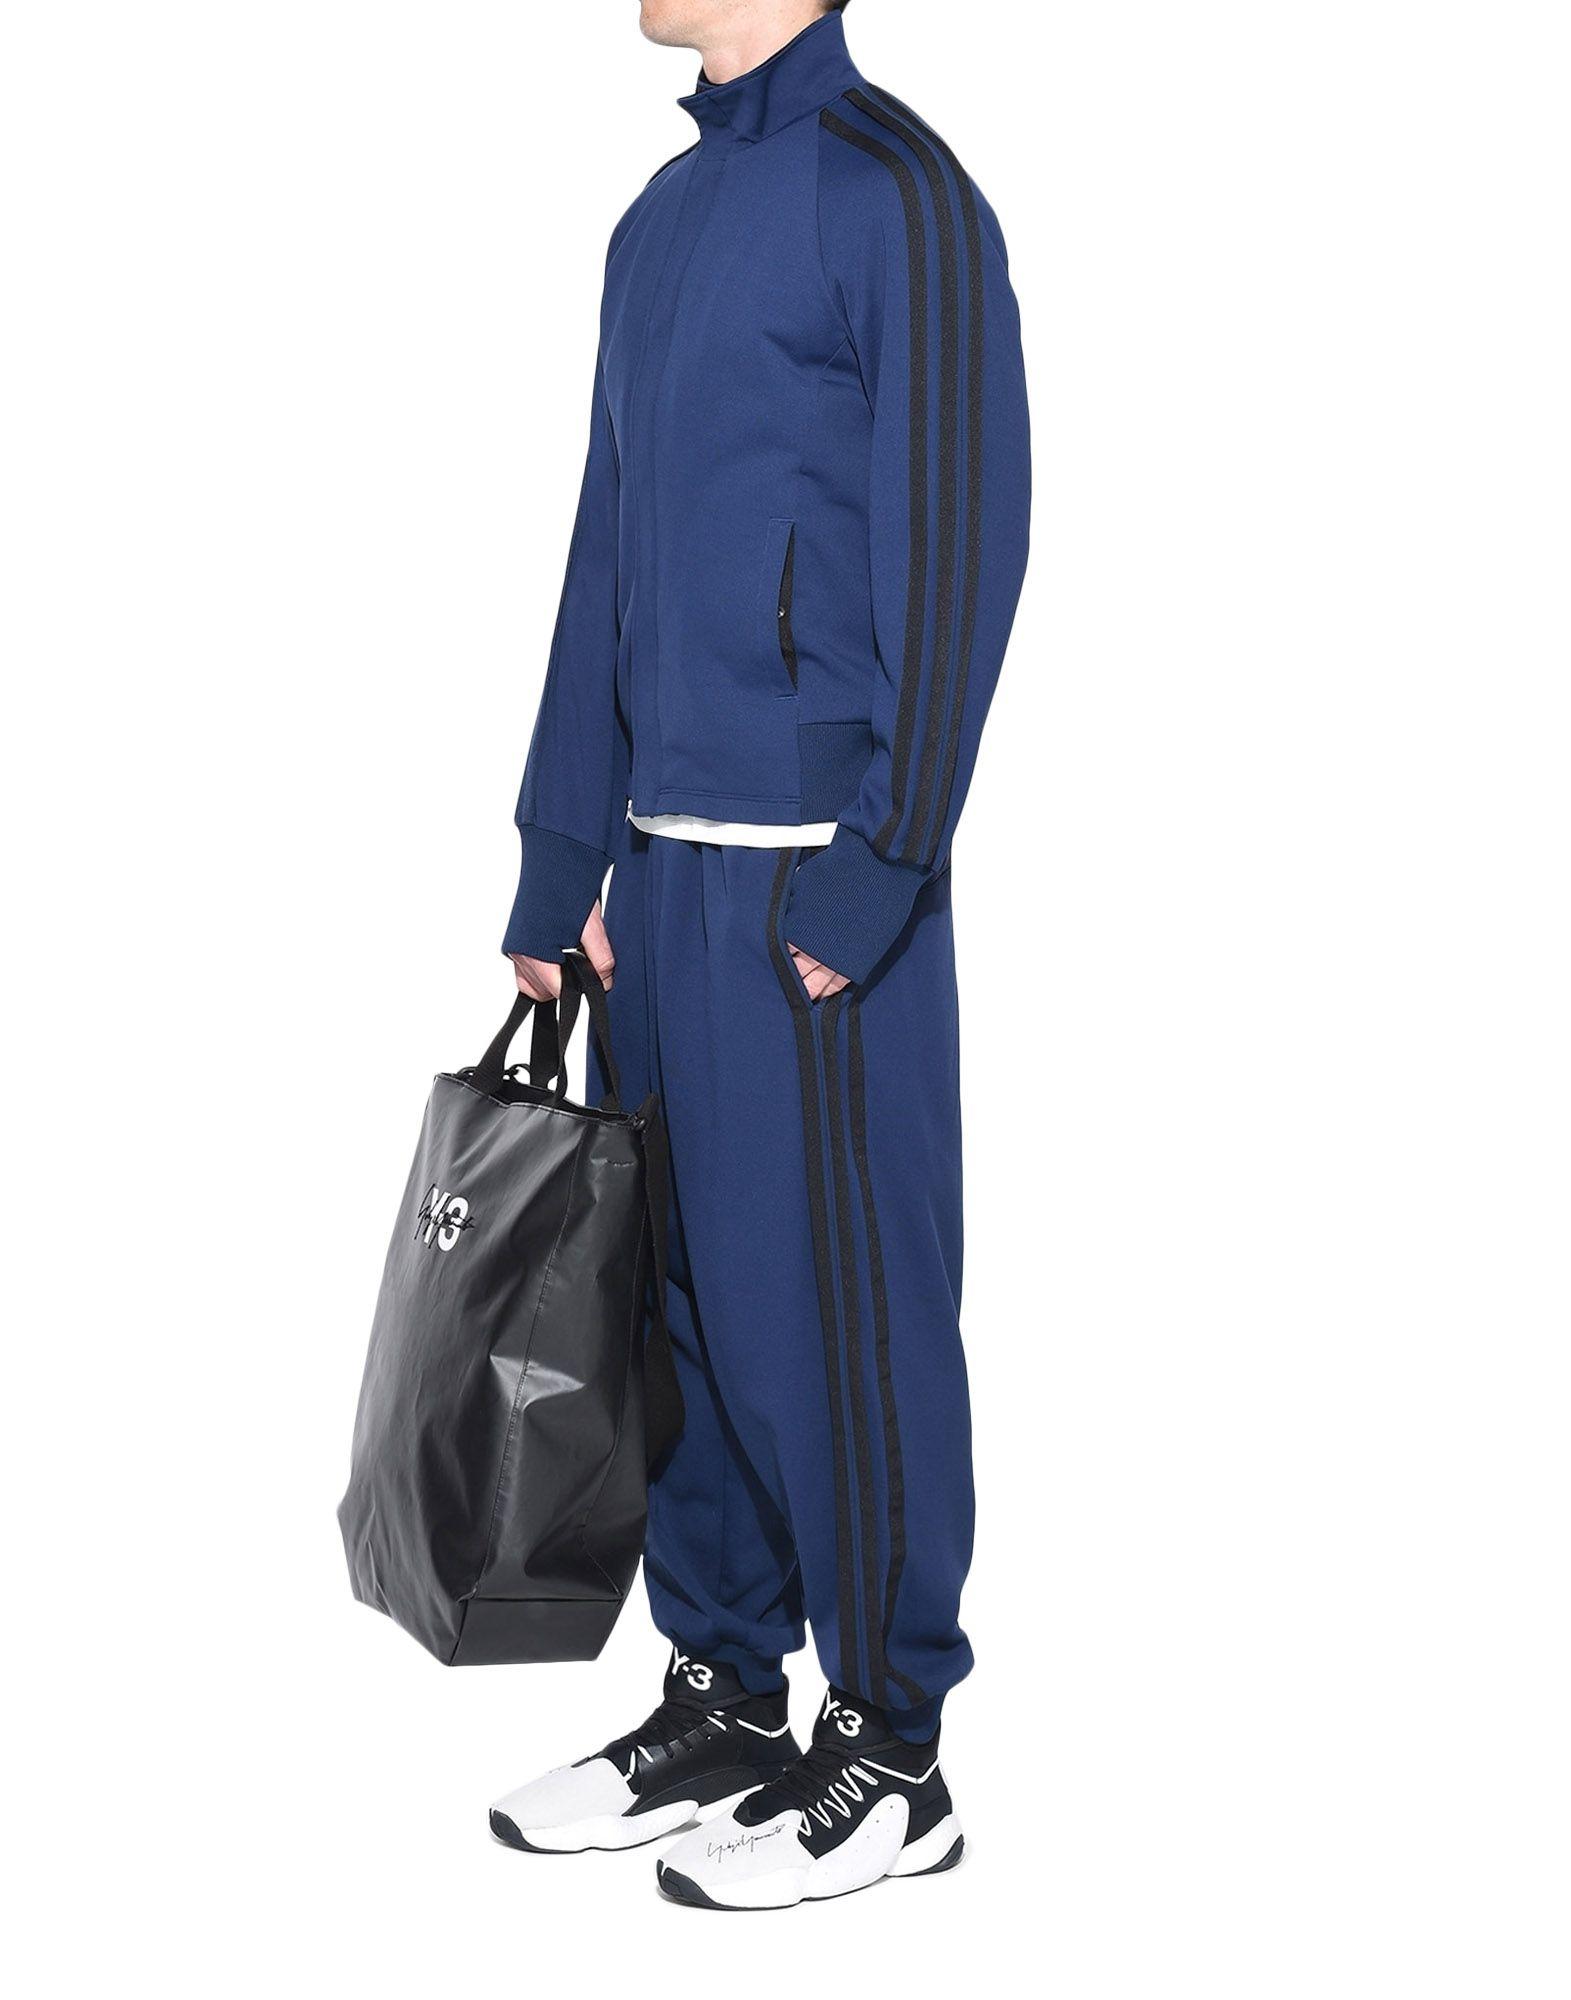 Y-3 Y-3 3-Stripes Selvedge Matte Track Pants Track pant Man a